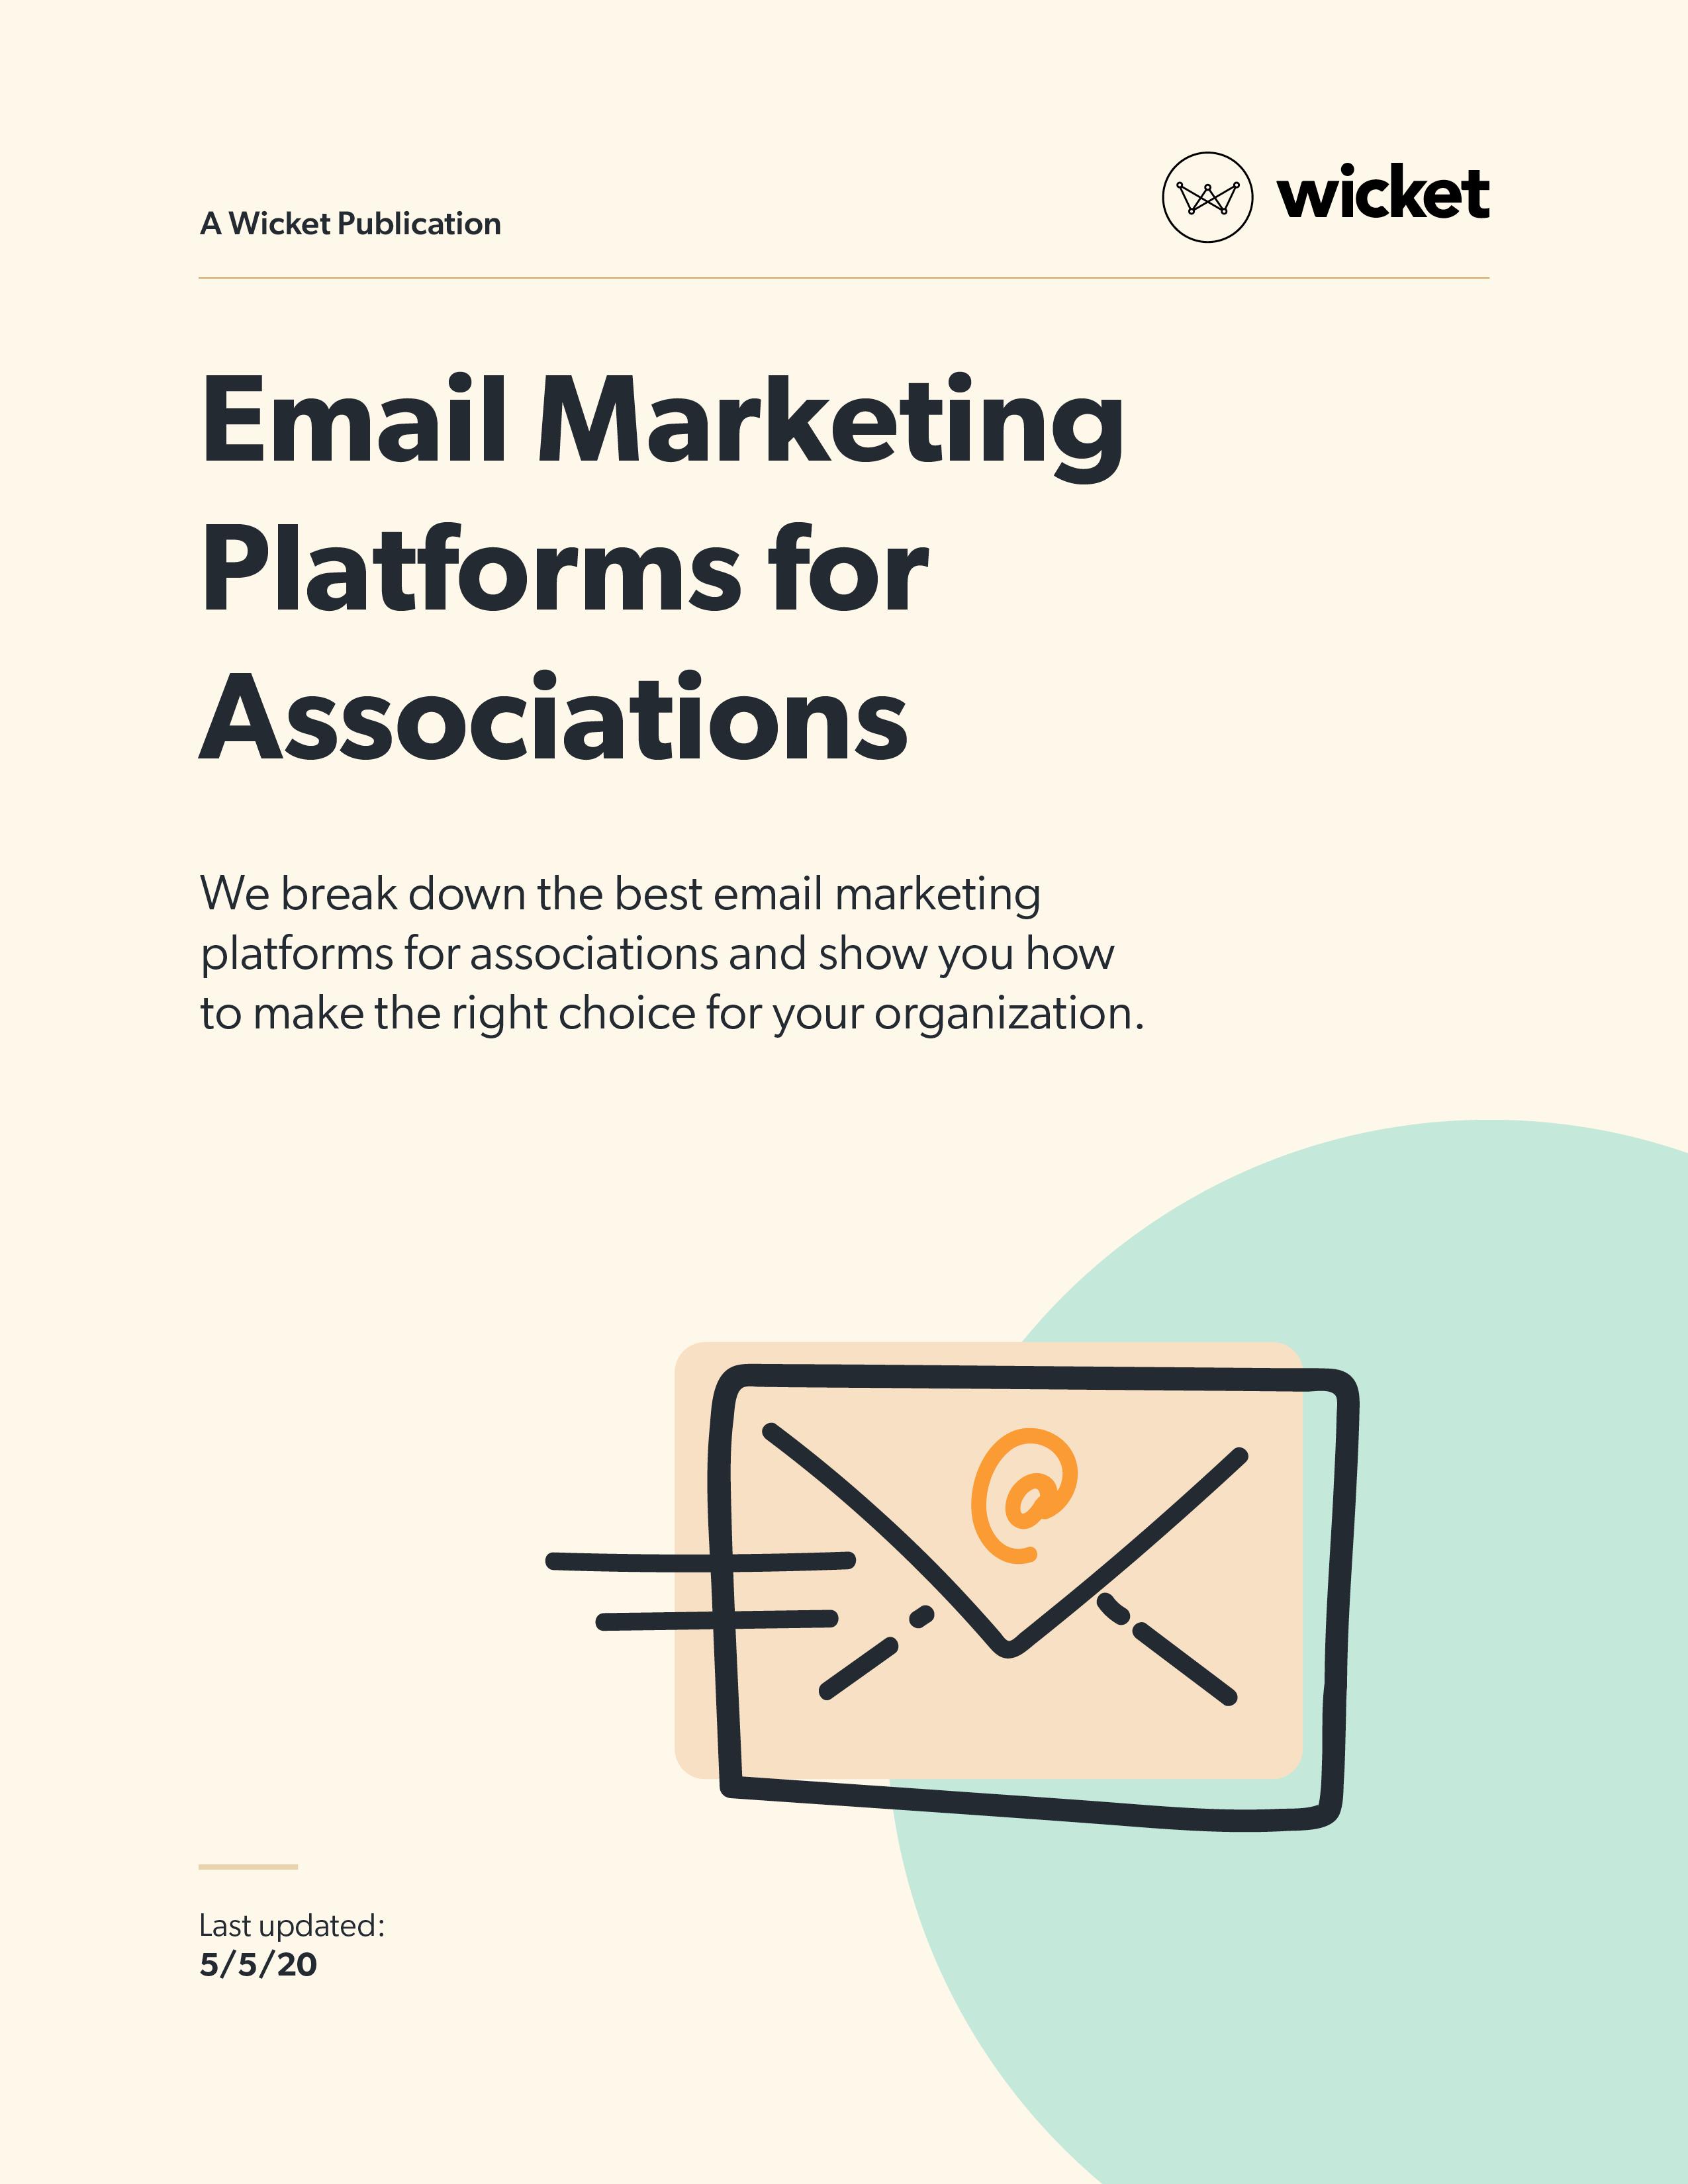 Email Marketing Platforms for Associations